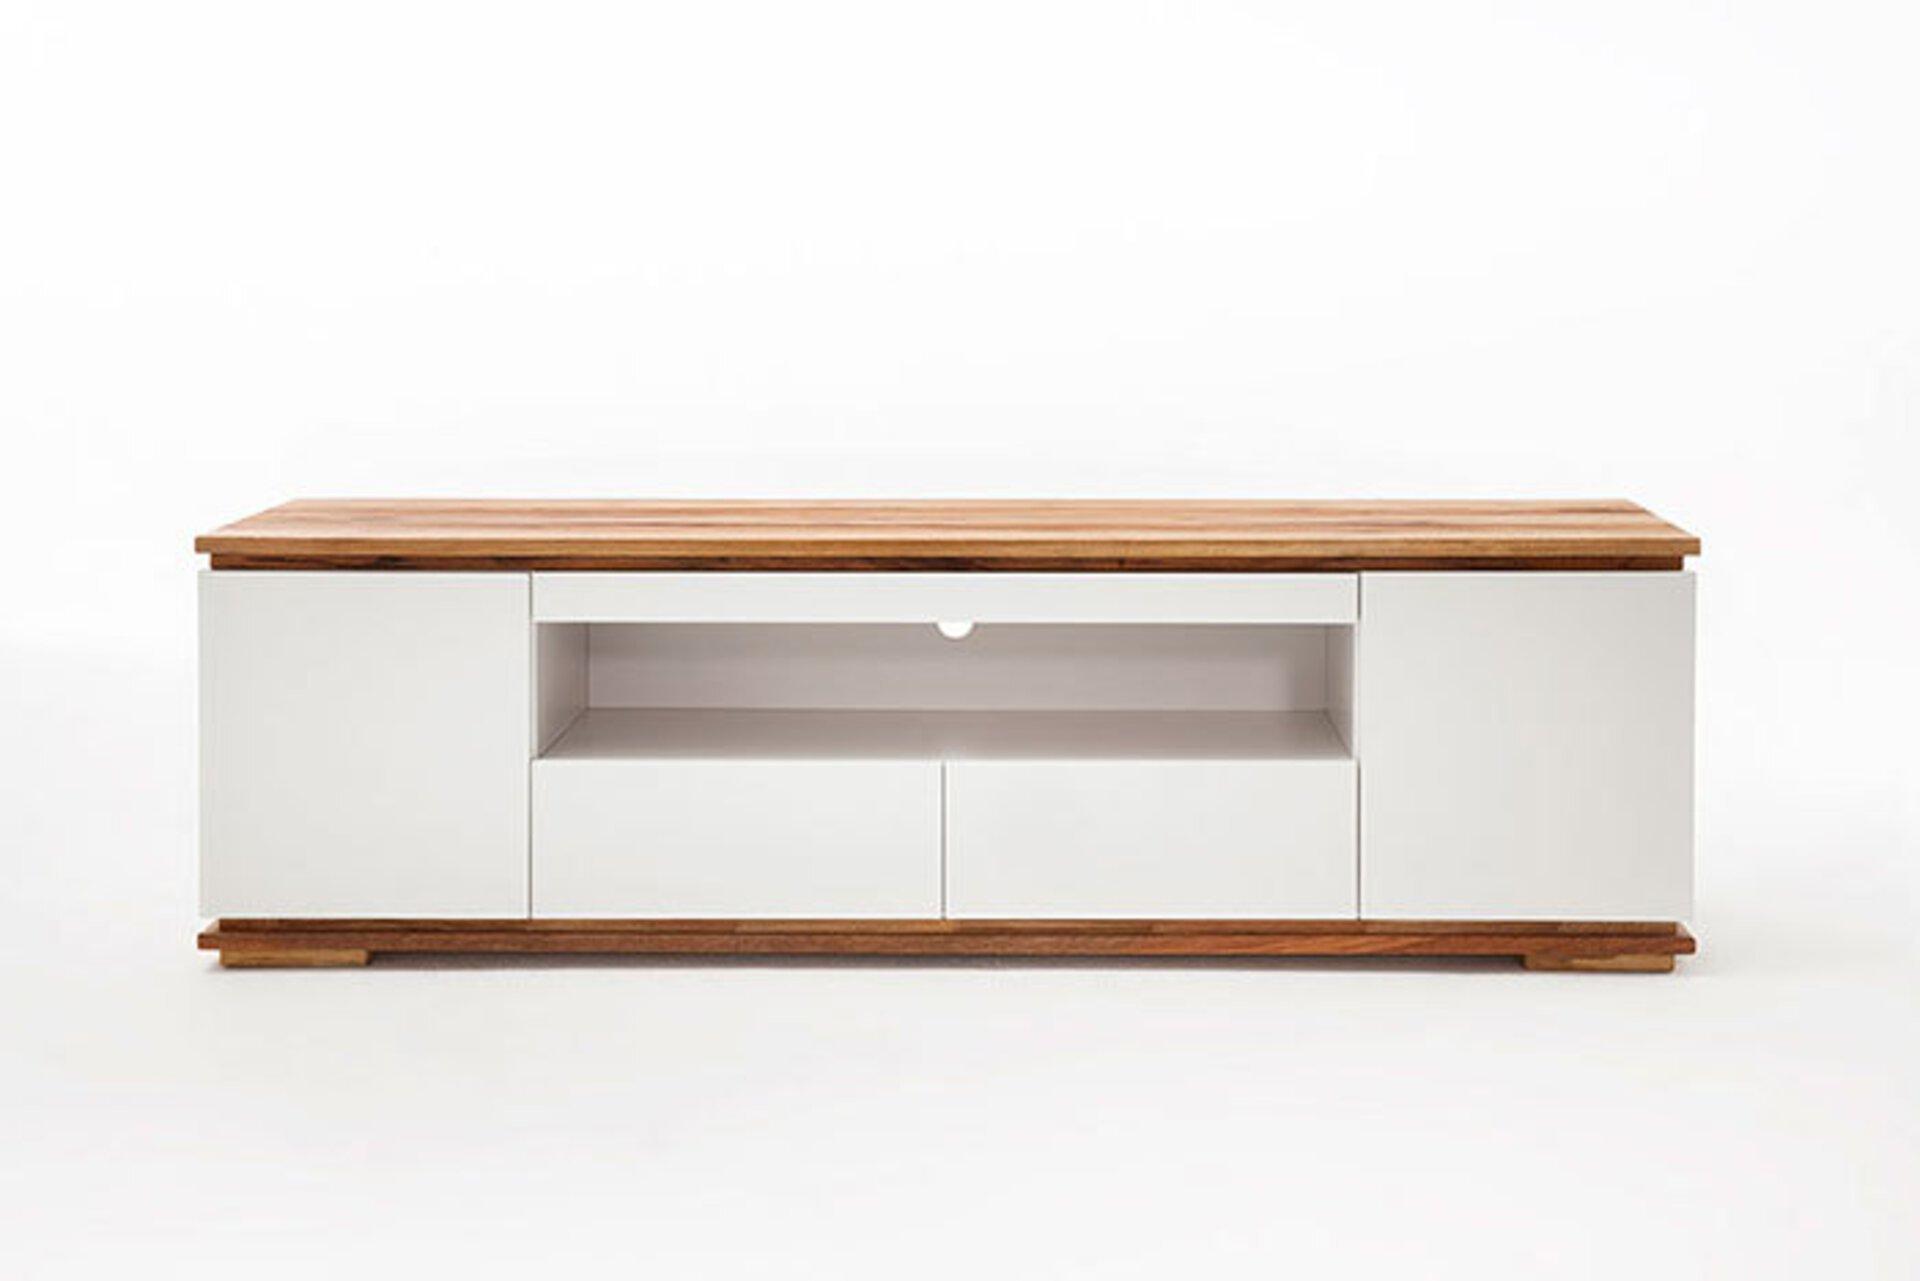 Lowboard CHIARO MCA furniture Holzwerkstoff 40 x 54 x 202 cm